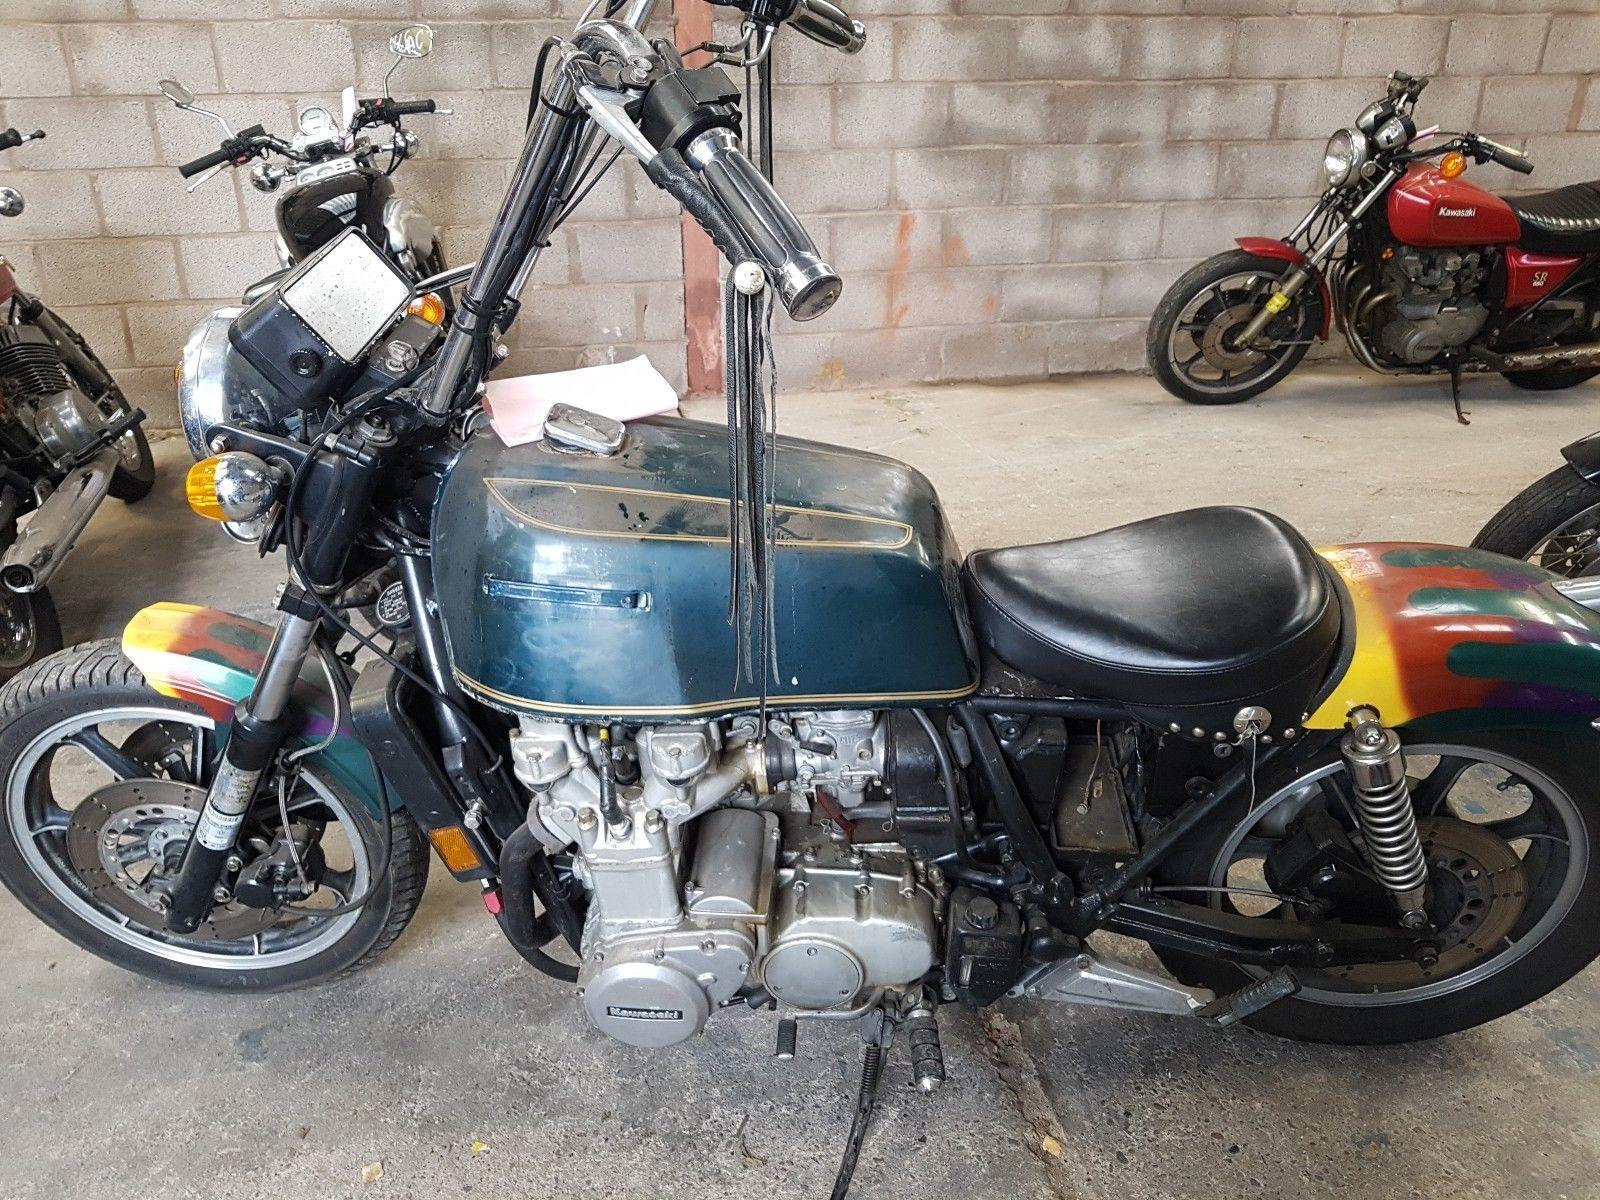 eBay: 1980 Kawasaki KZ 1300 | Classic Motorcycle NO RESERVE